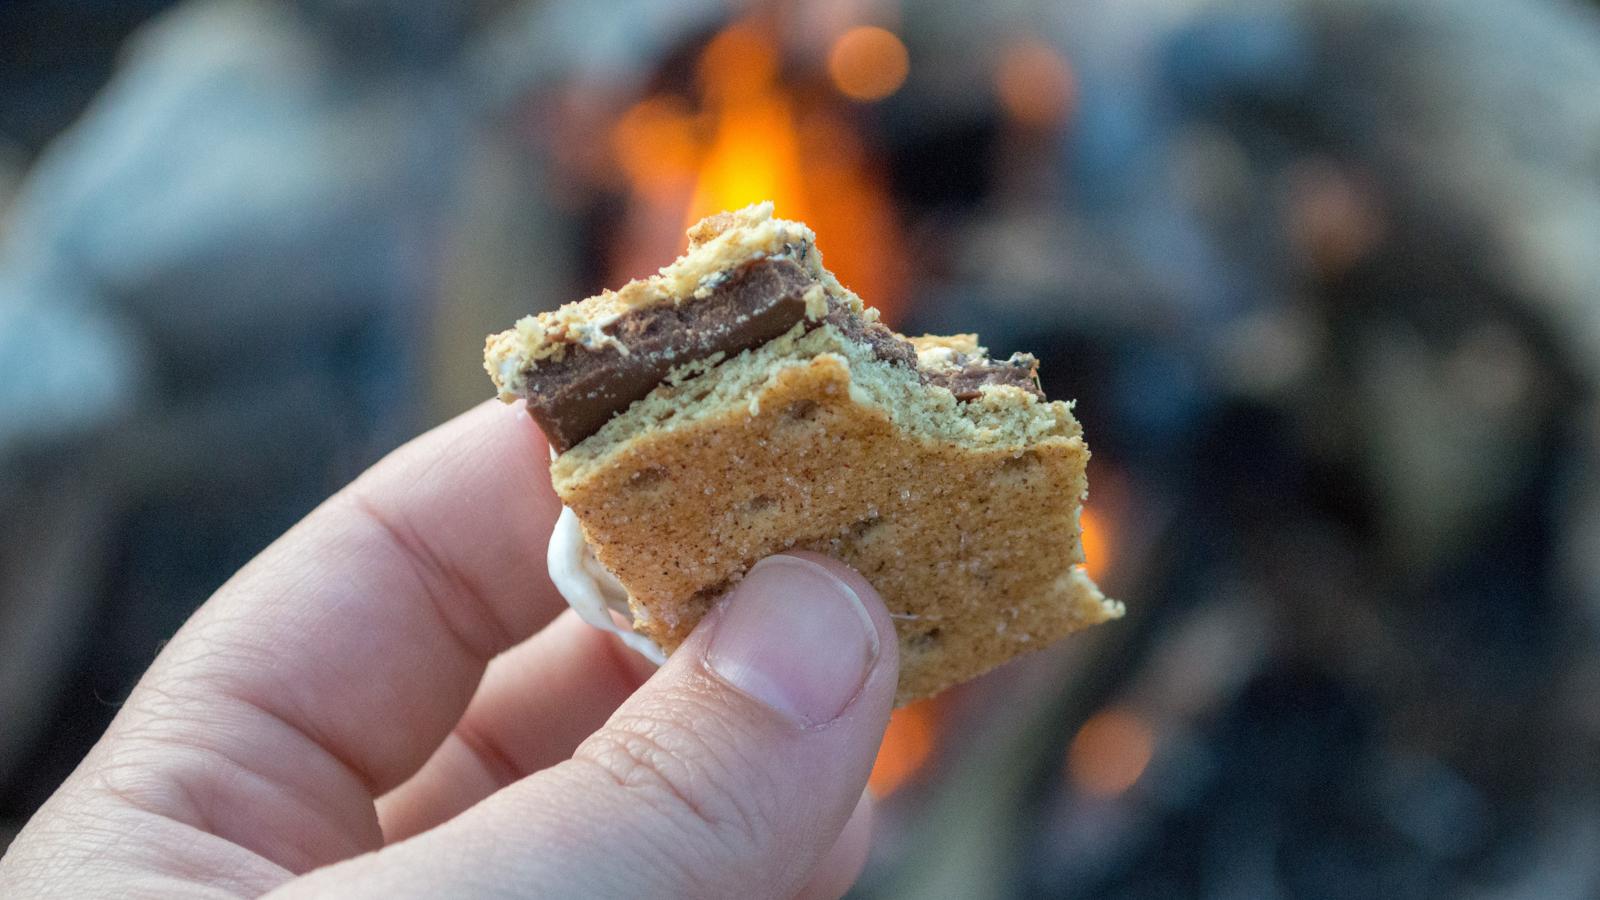 S'mores delicieuse recette de feu de camp